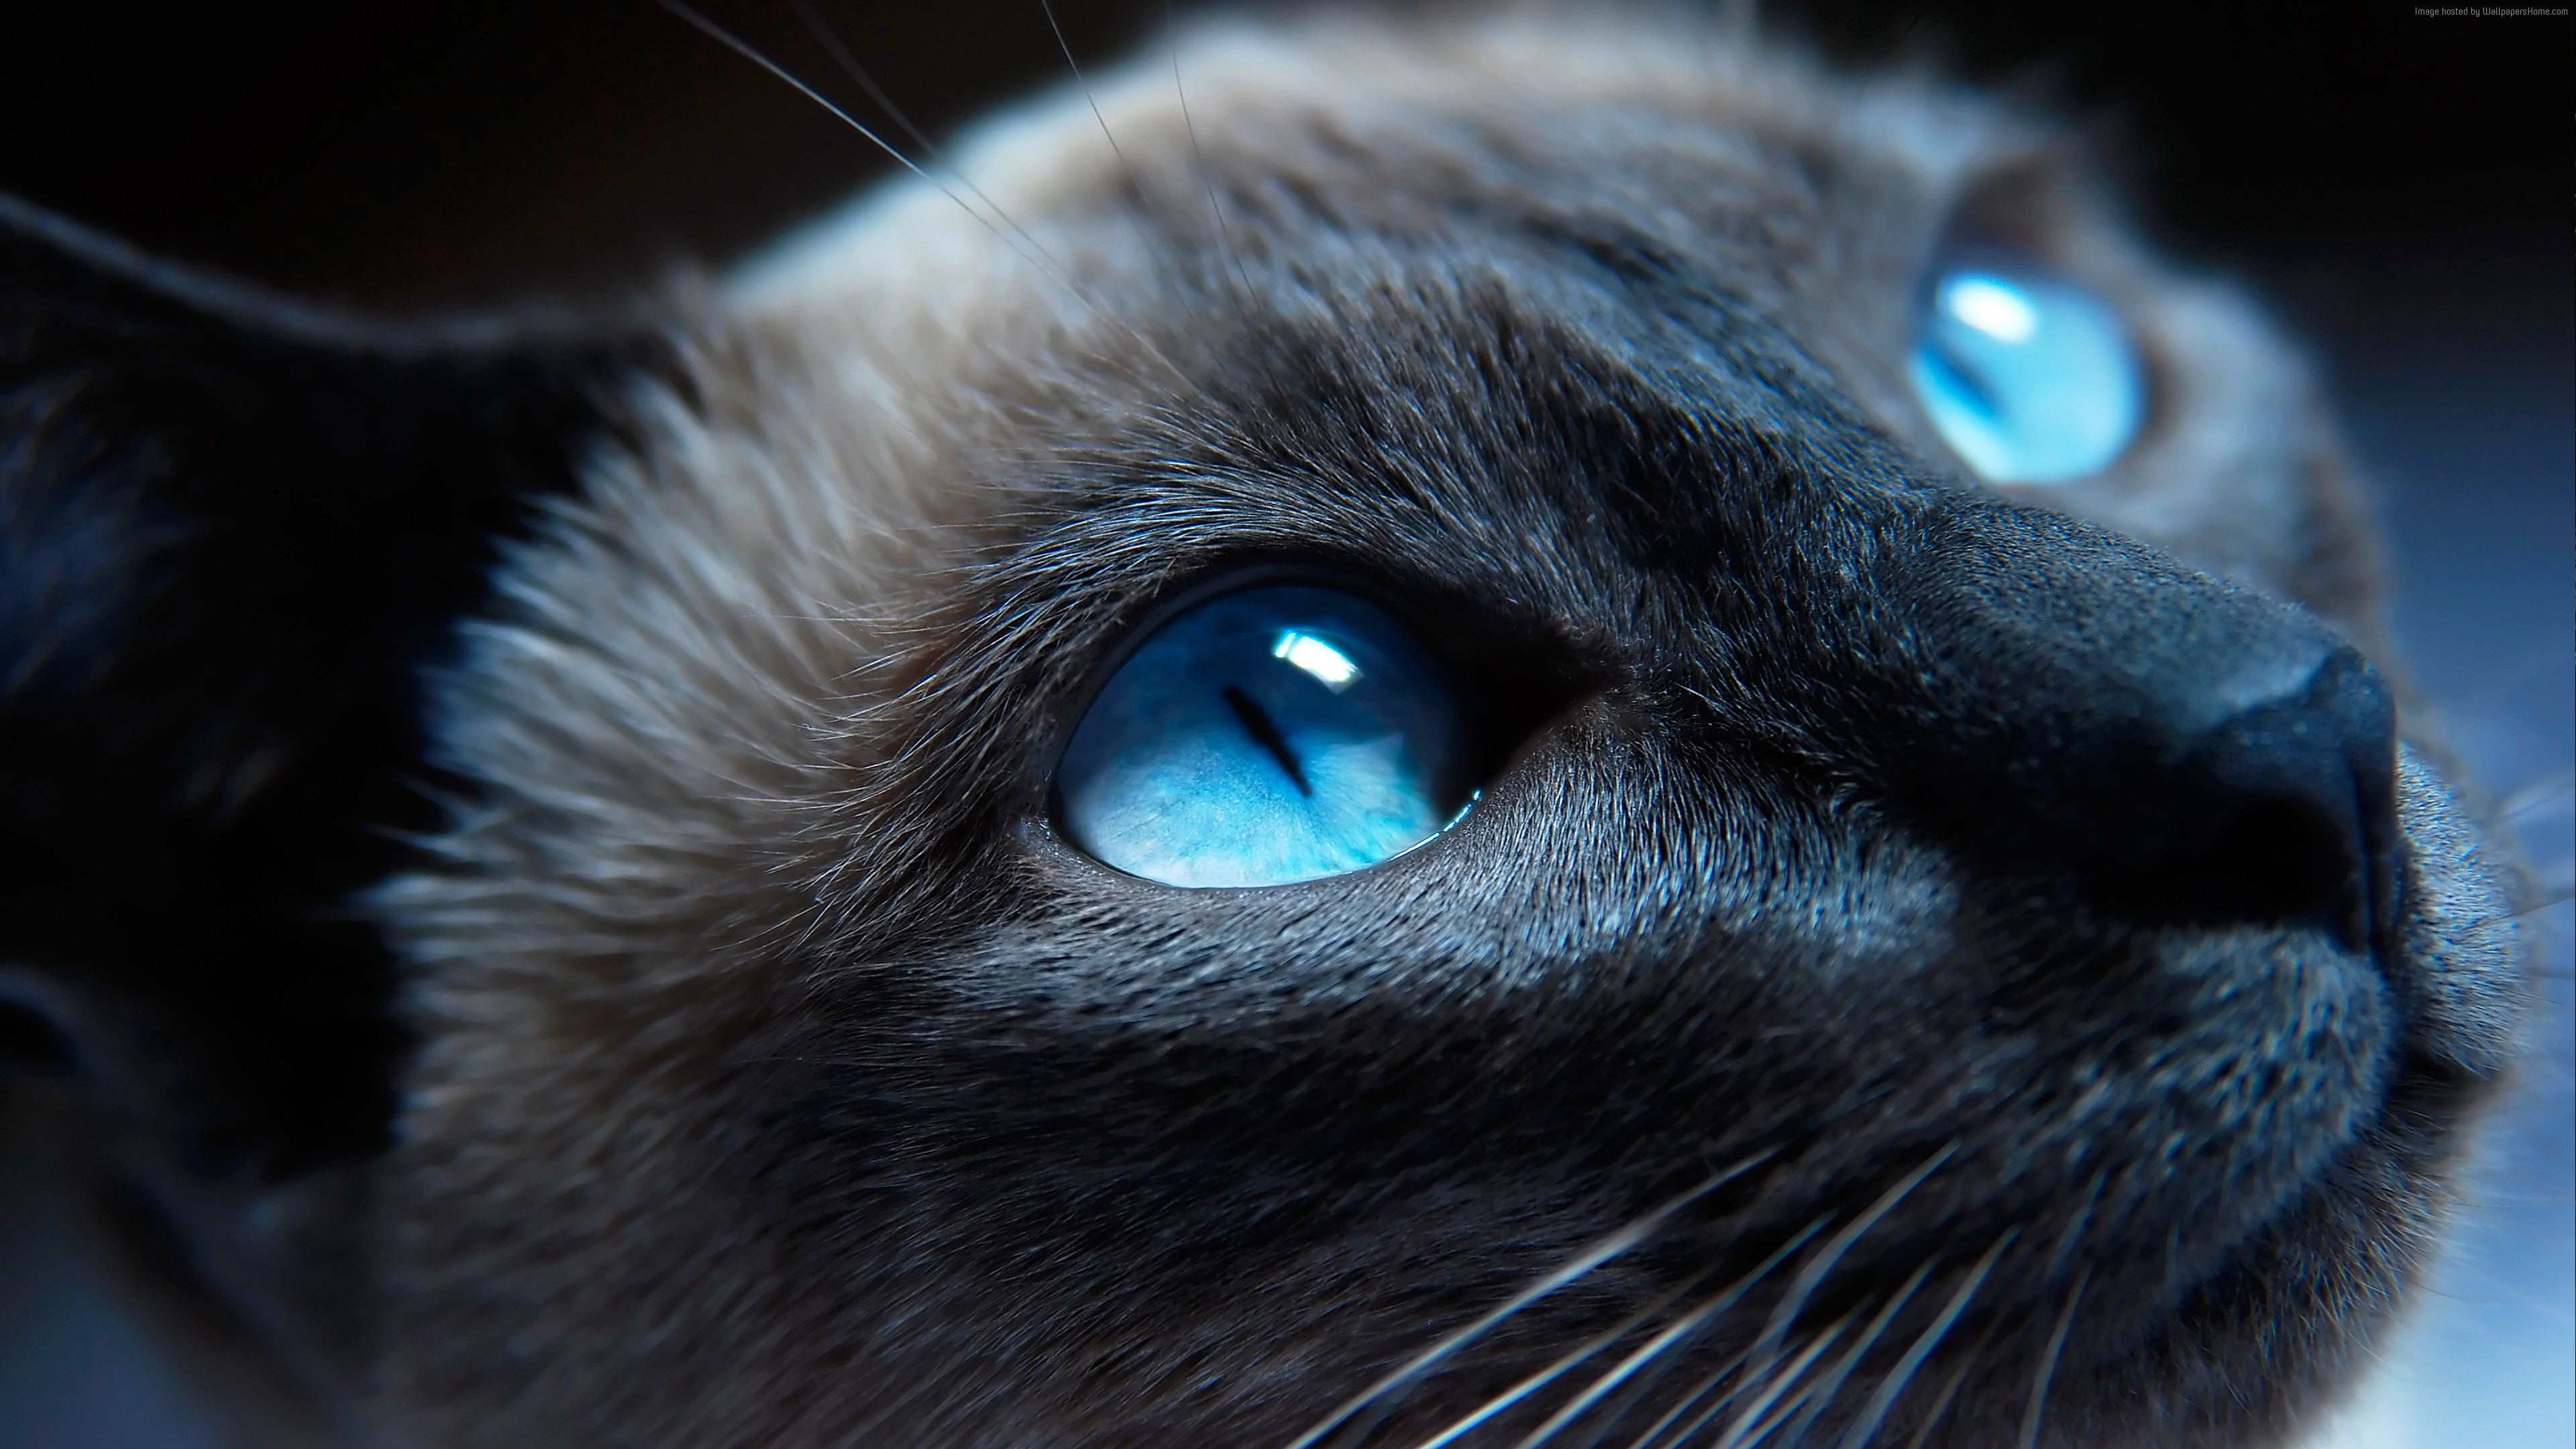 Desktop Wallpaper Siamese Cat Kitty Blue Eyes Muzzle Close Up 3840x2160